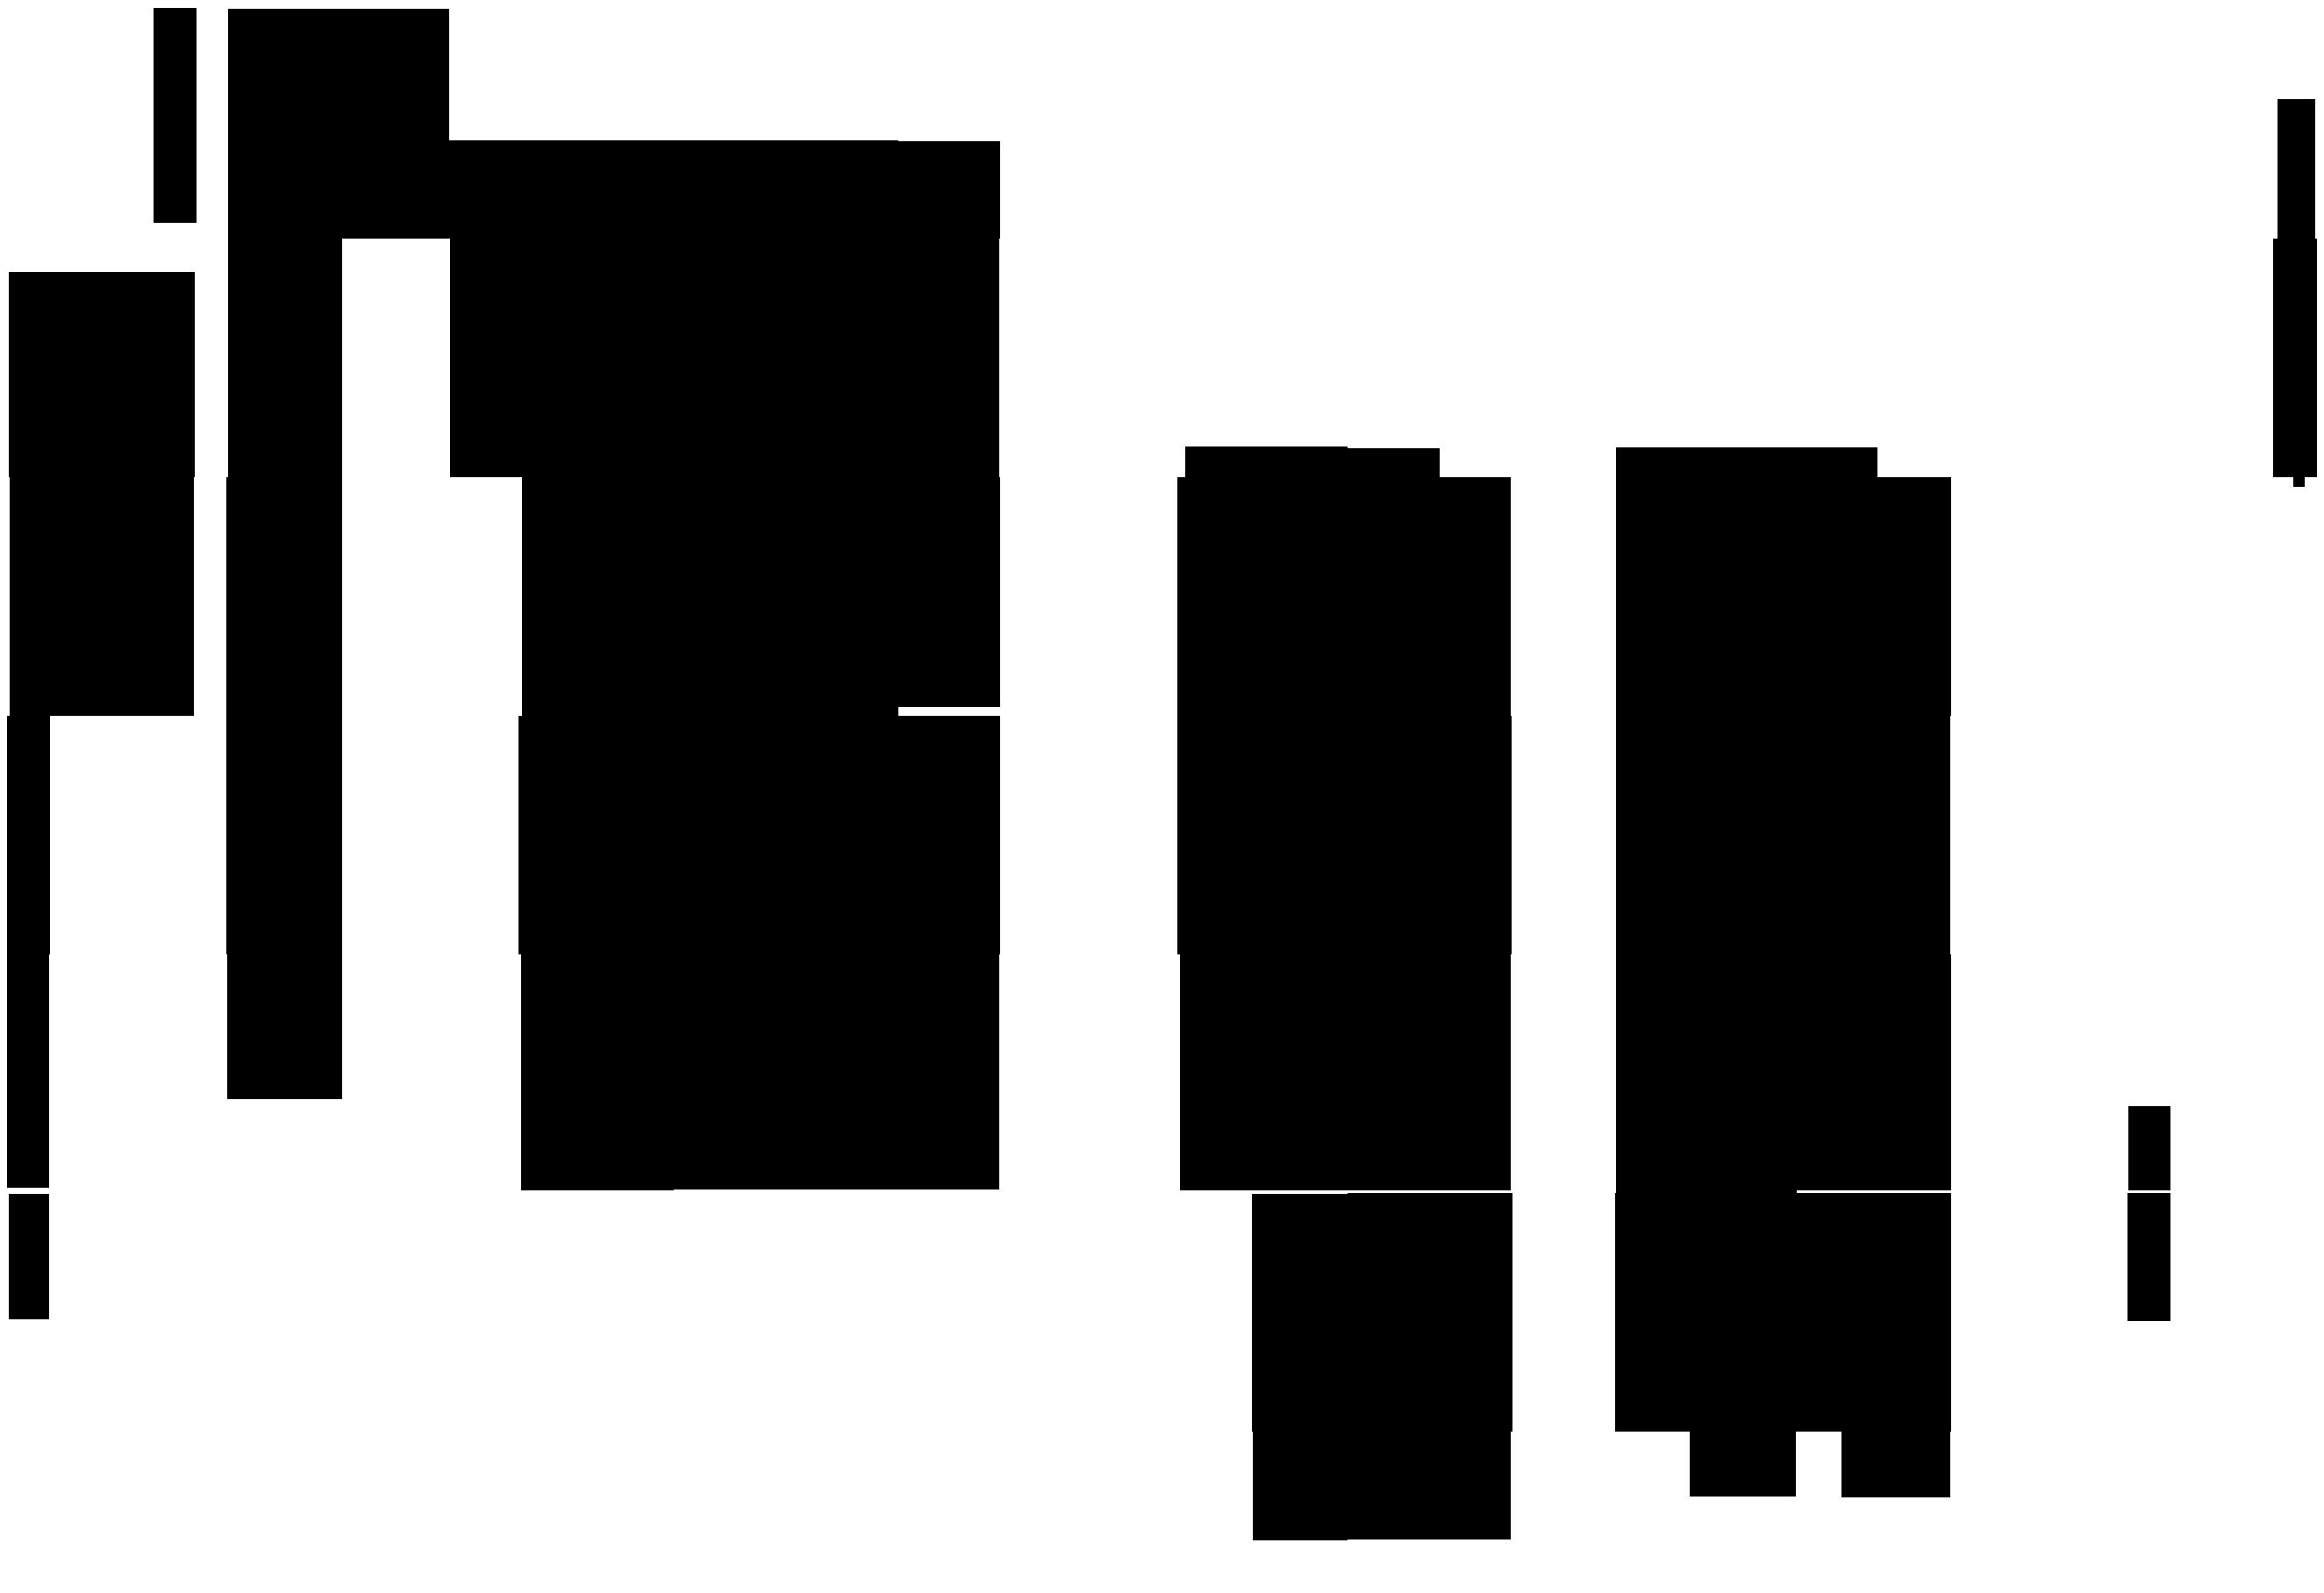 岡野詩130823-1